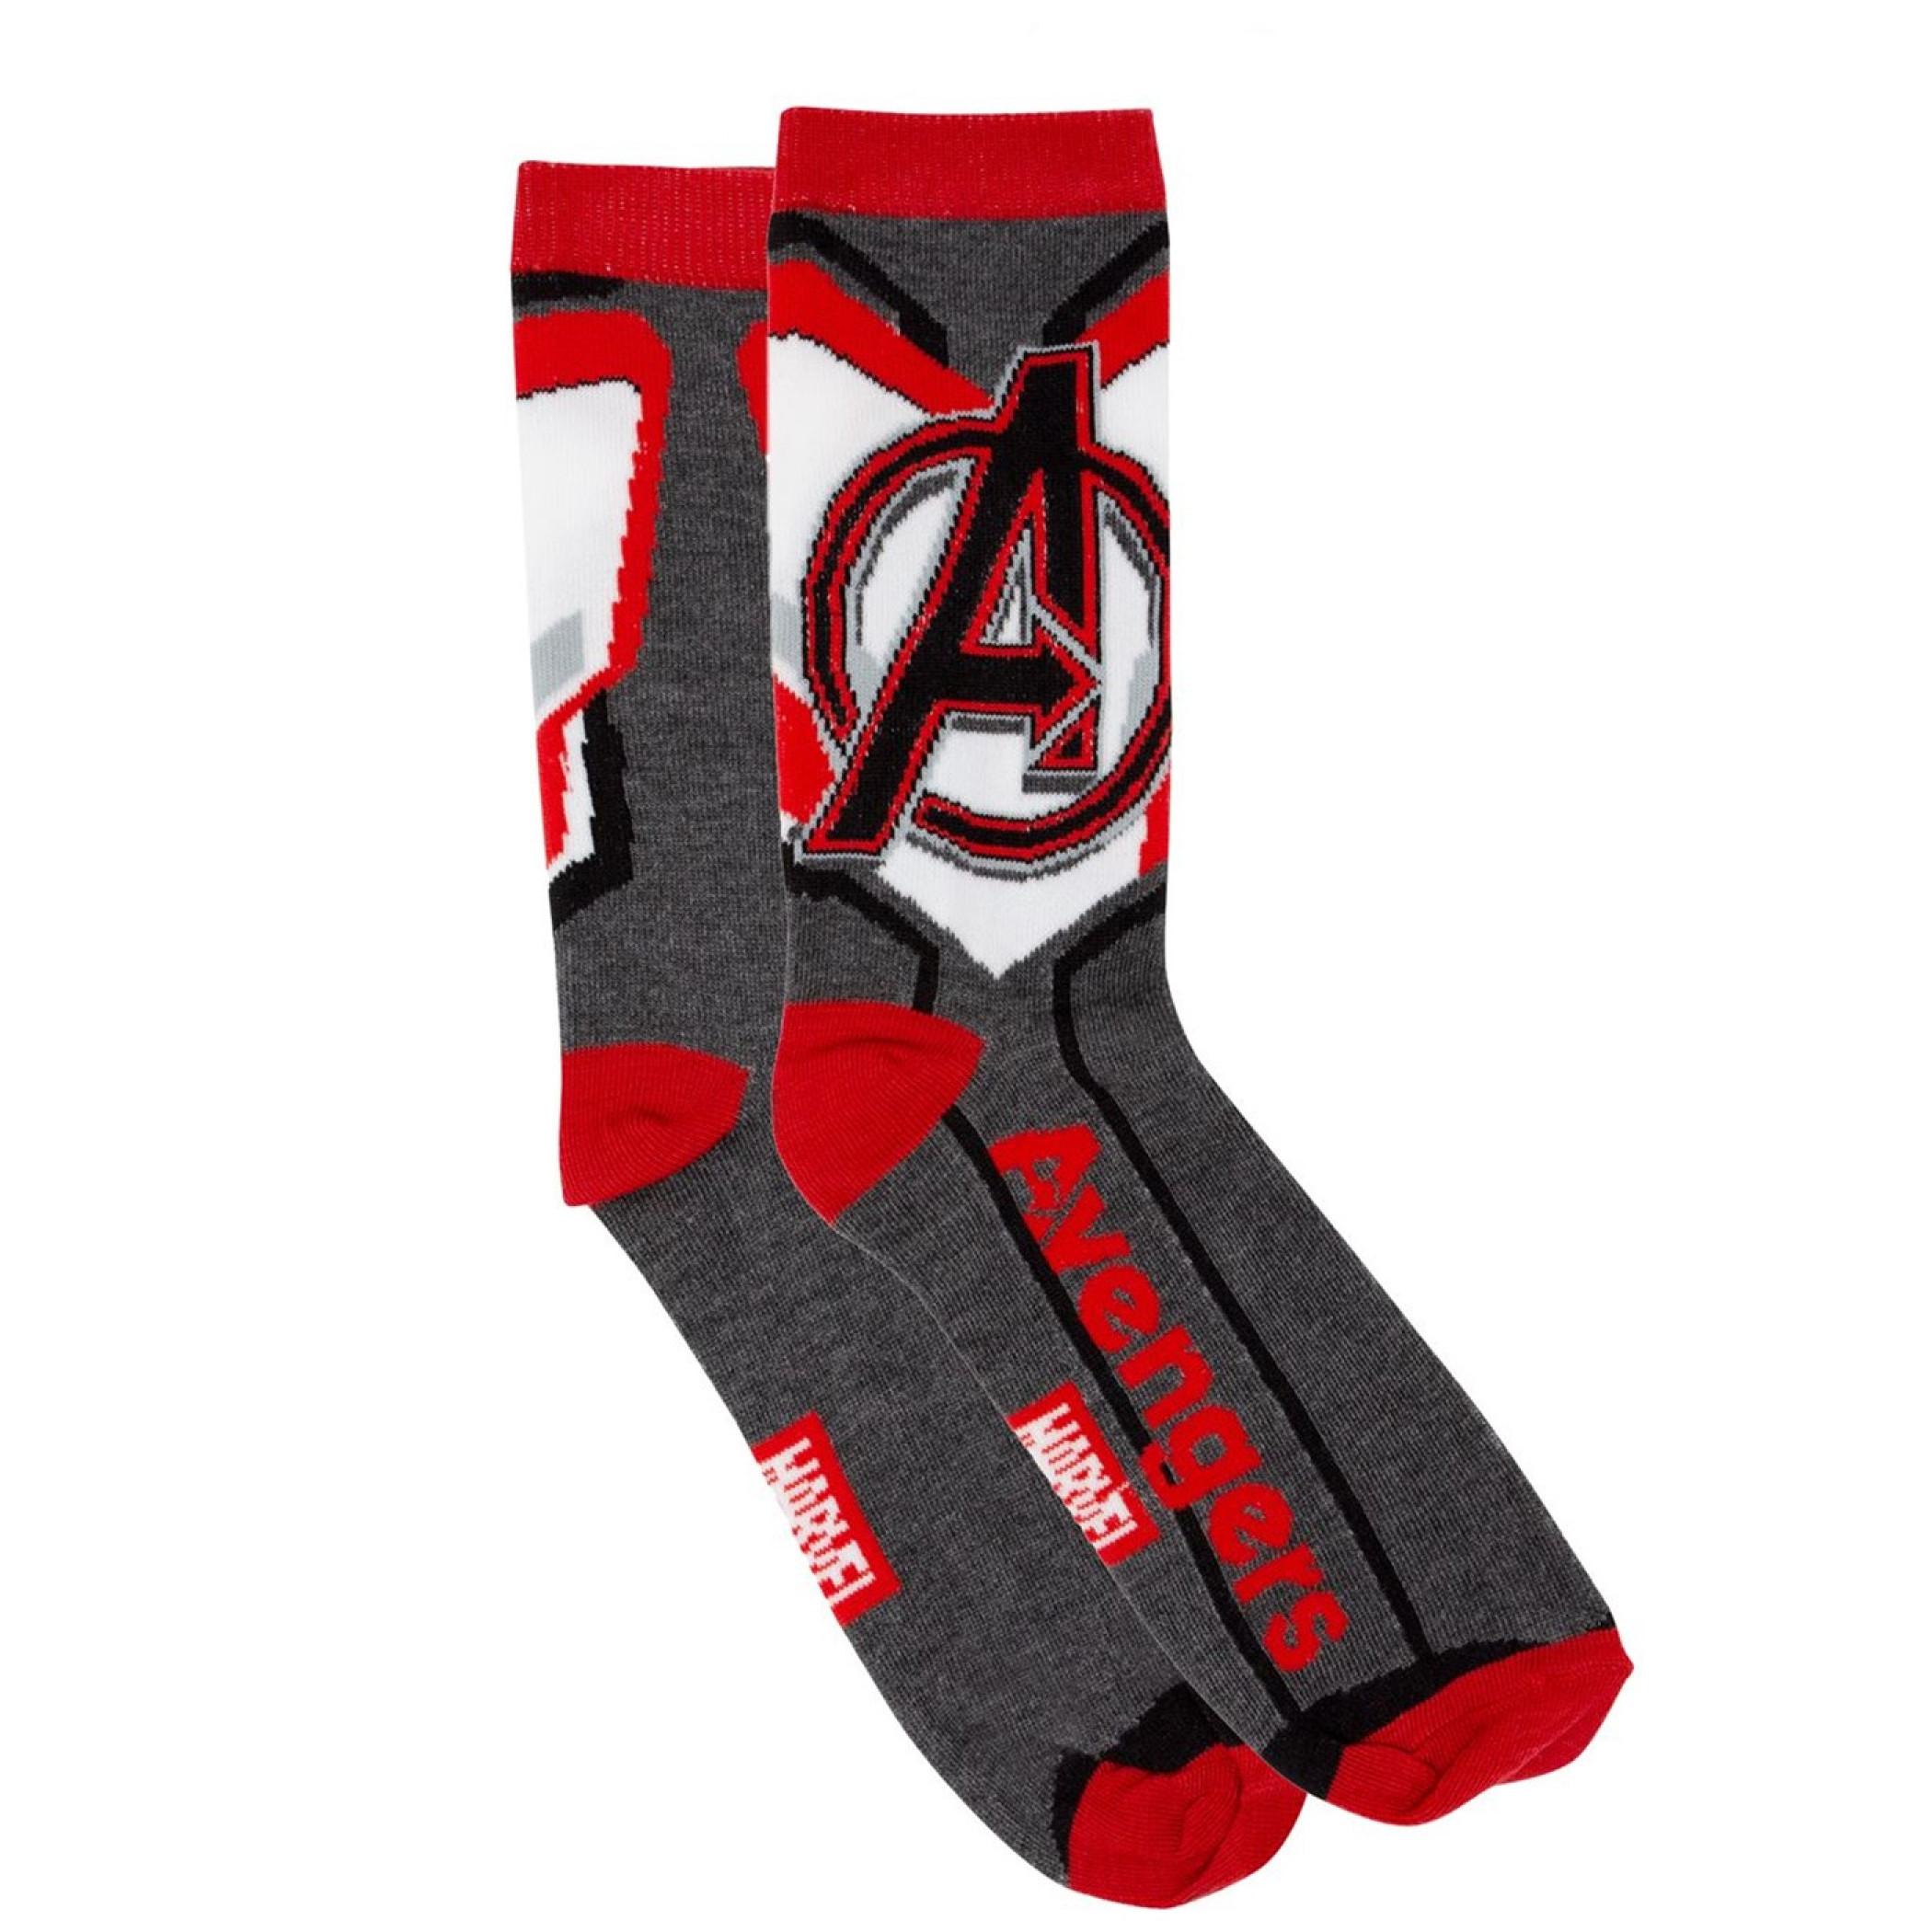 Marvel Brand Text and Avengers Costume Crew Socks 2-Pair Pack